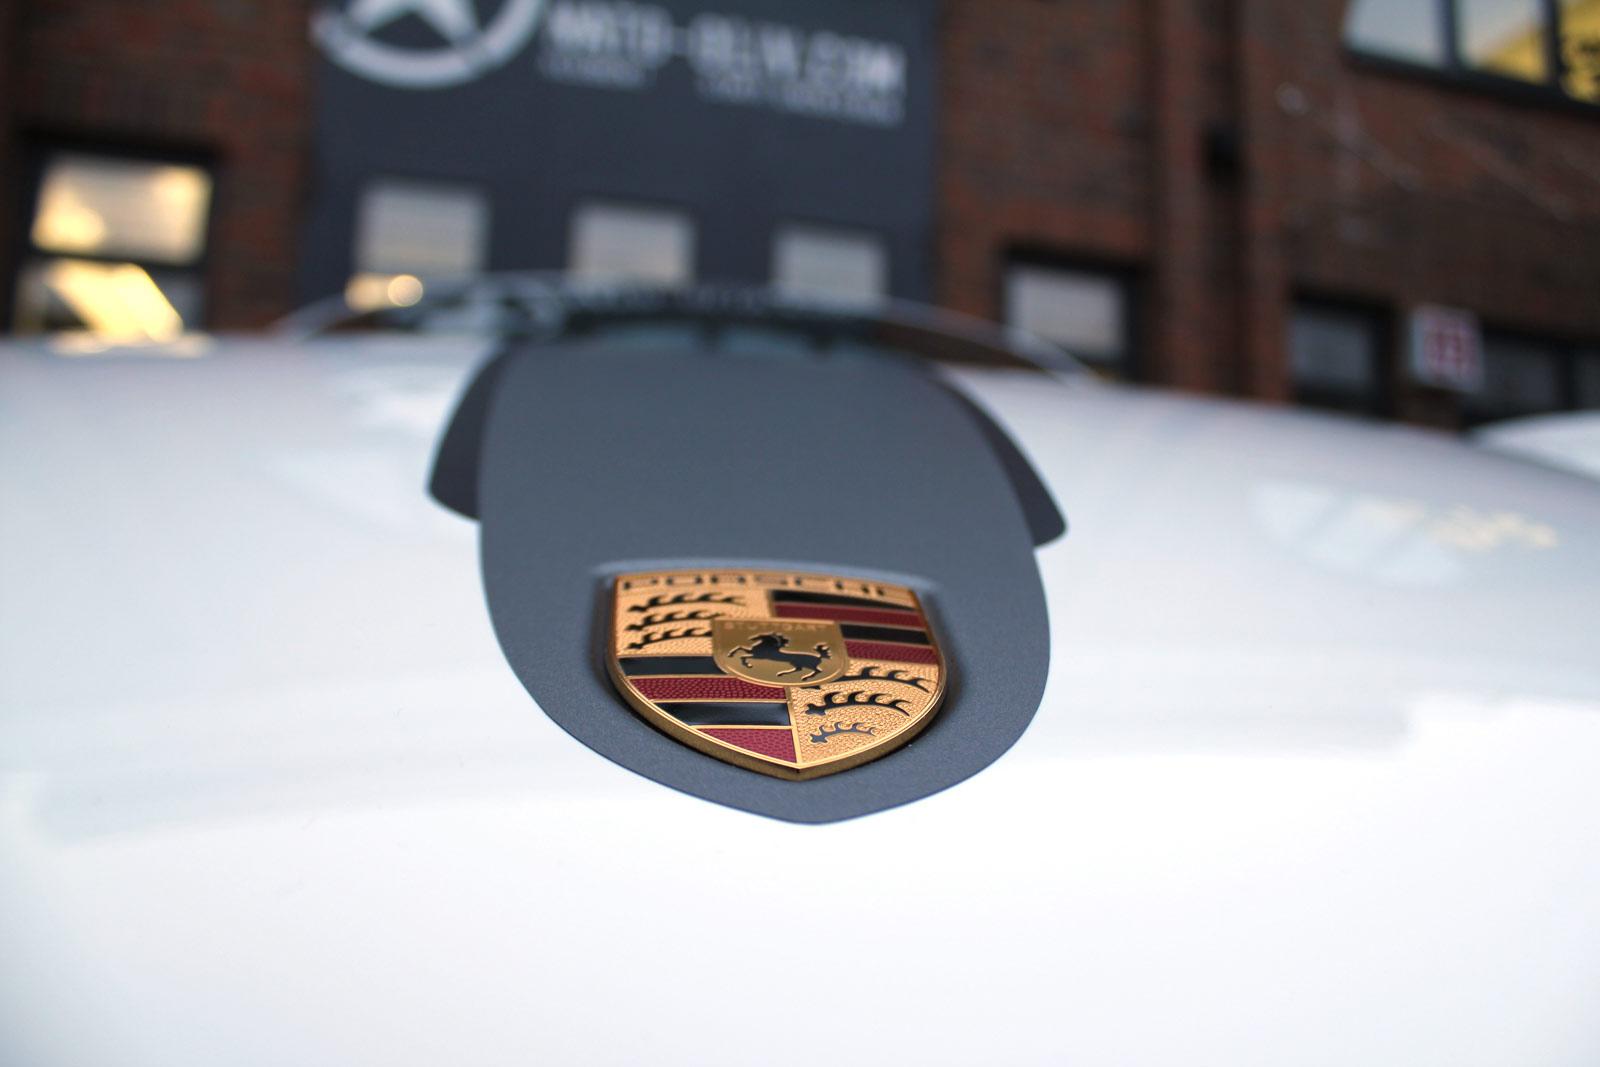 Porsche_Cayman_2014_weiss_Rallyestreifen_gunmetal_metallic_matt_mit_schwarz_matt_06